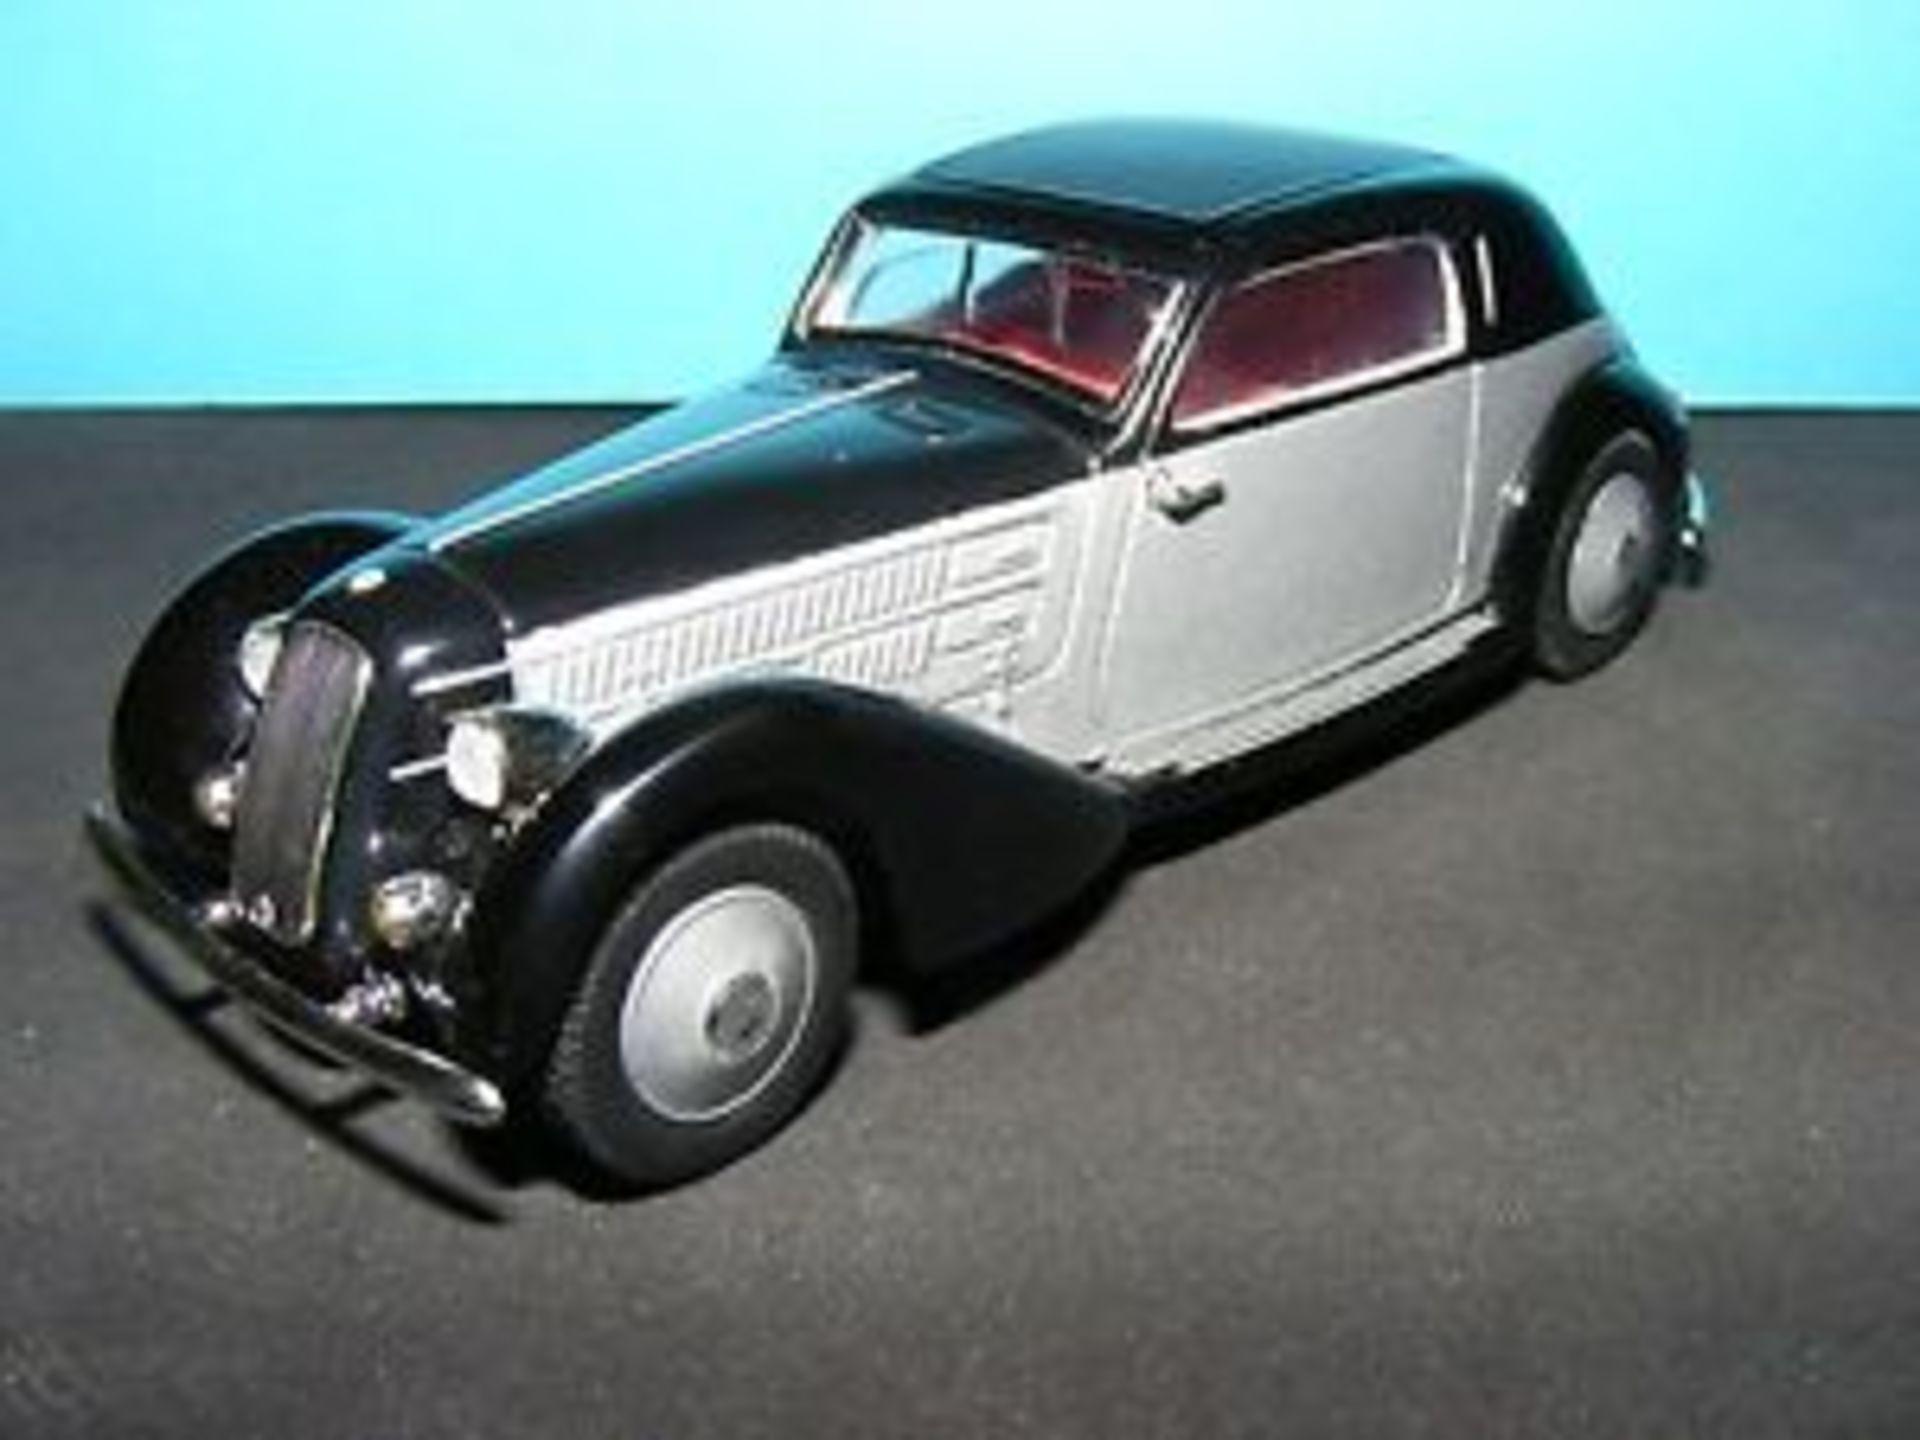 Lot 10358 - V Brand New 1/43 Diecast 1934 Lancia Astura Coupe Gran Lusso - eBay Price £19.99